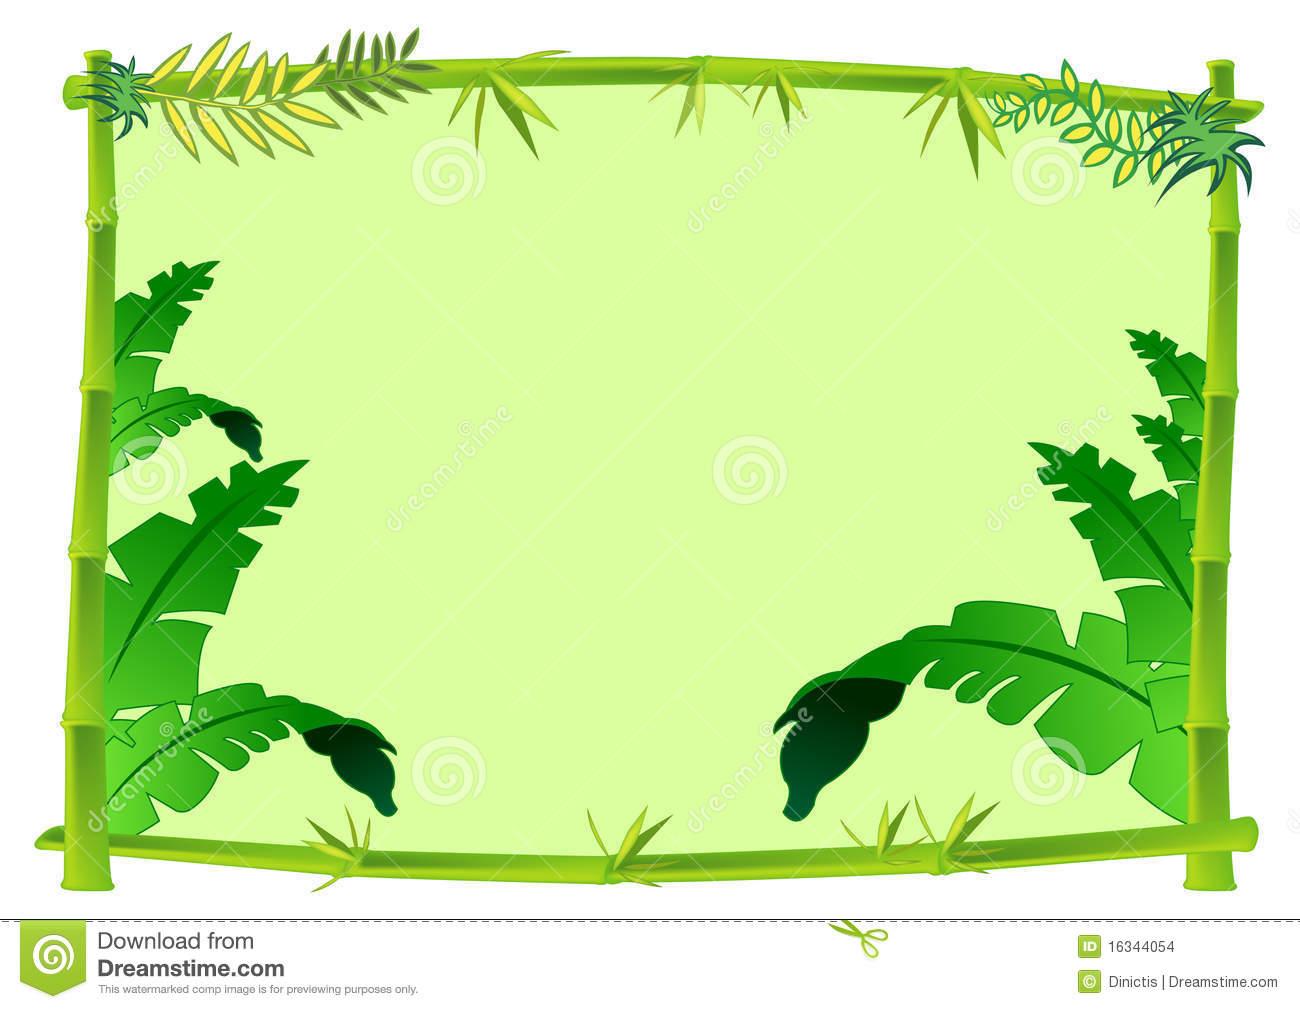 jungle clip art clipart panda free clipart images rh clipartpanda com free jungle clipart images free jungle book clip art